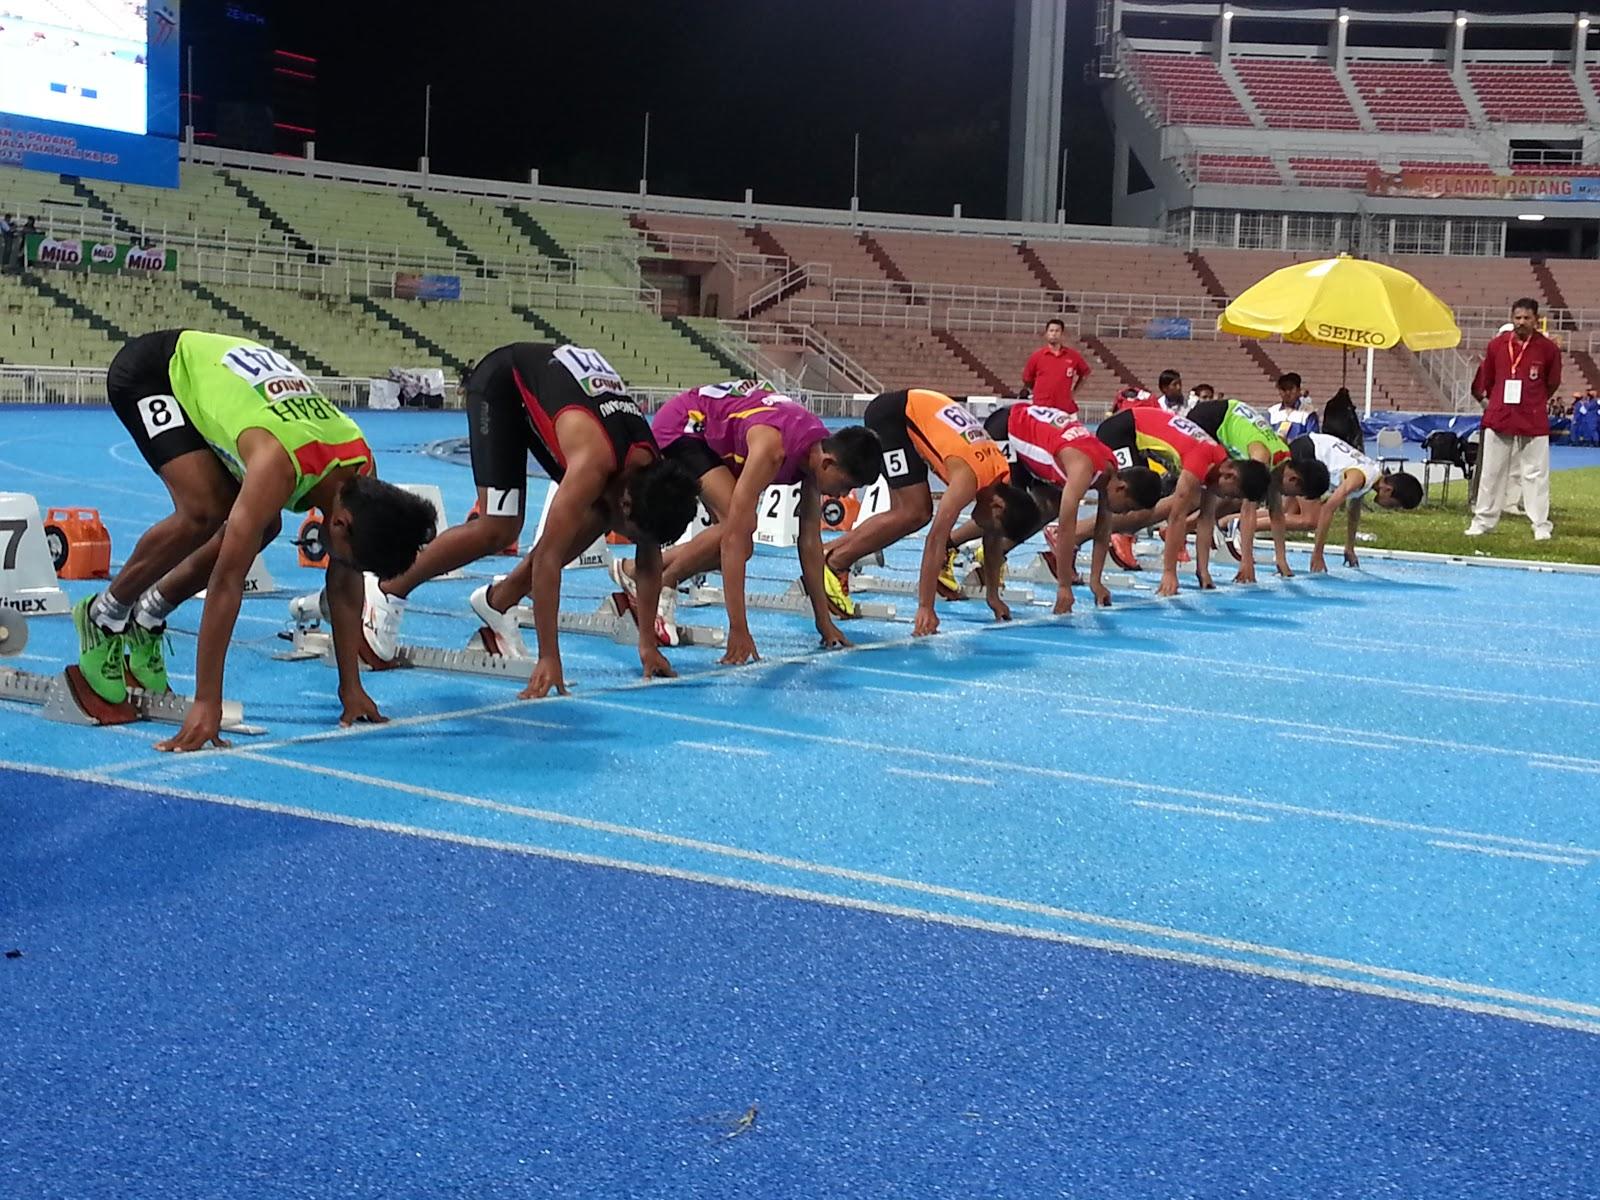 Mssm Olahraga Kejohanan Balapan Dan Padang Majlis Sukan Sekolah Malaysia Mssm 2013